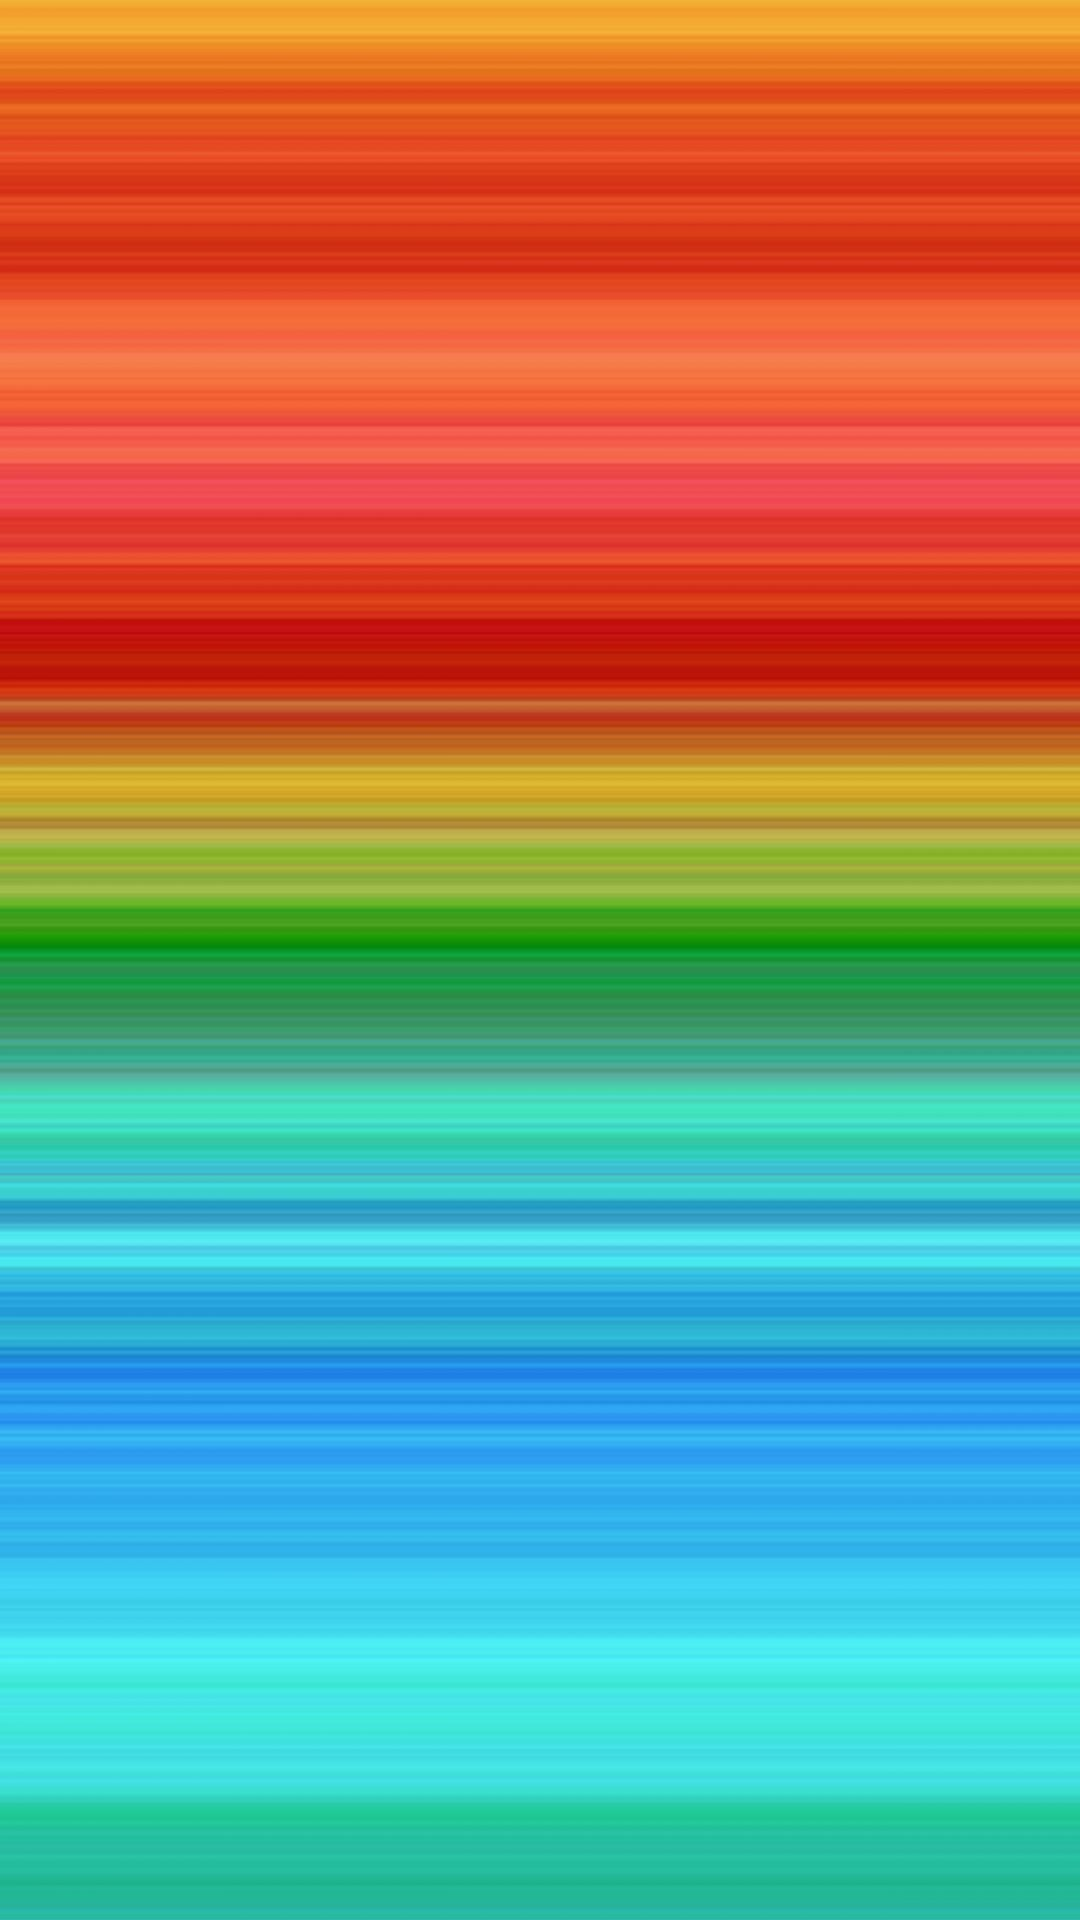 Rainbow Line Abstract Pattern